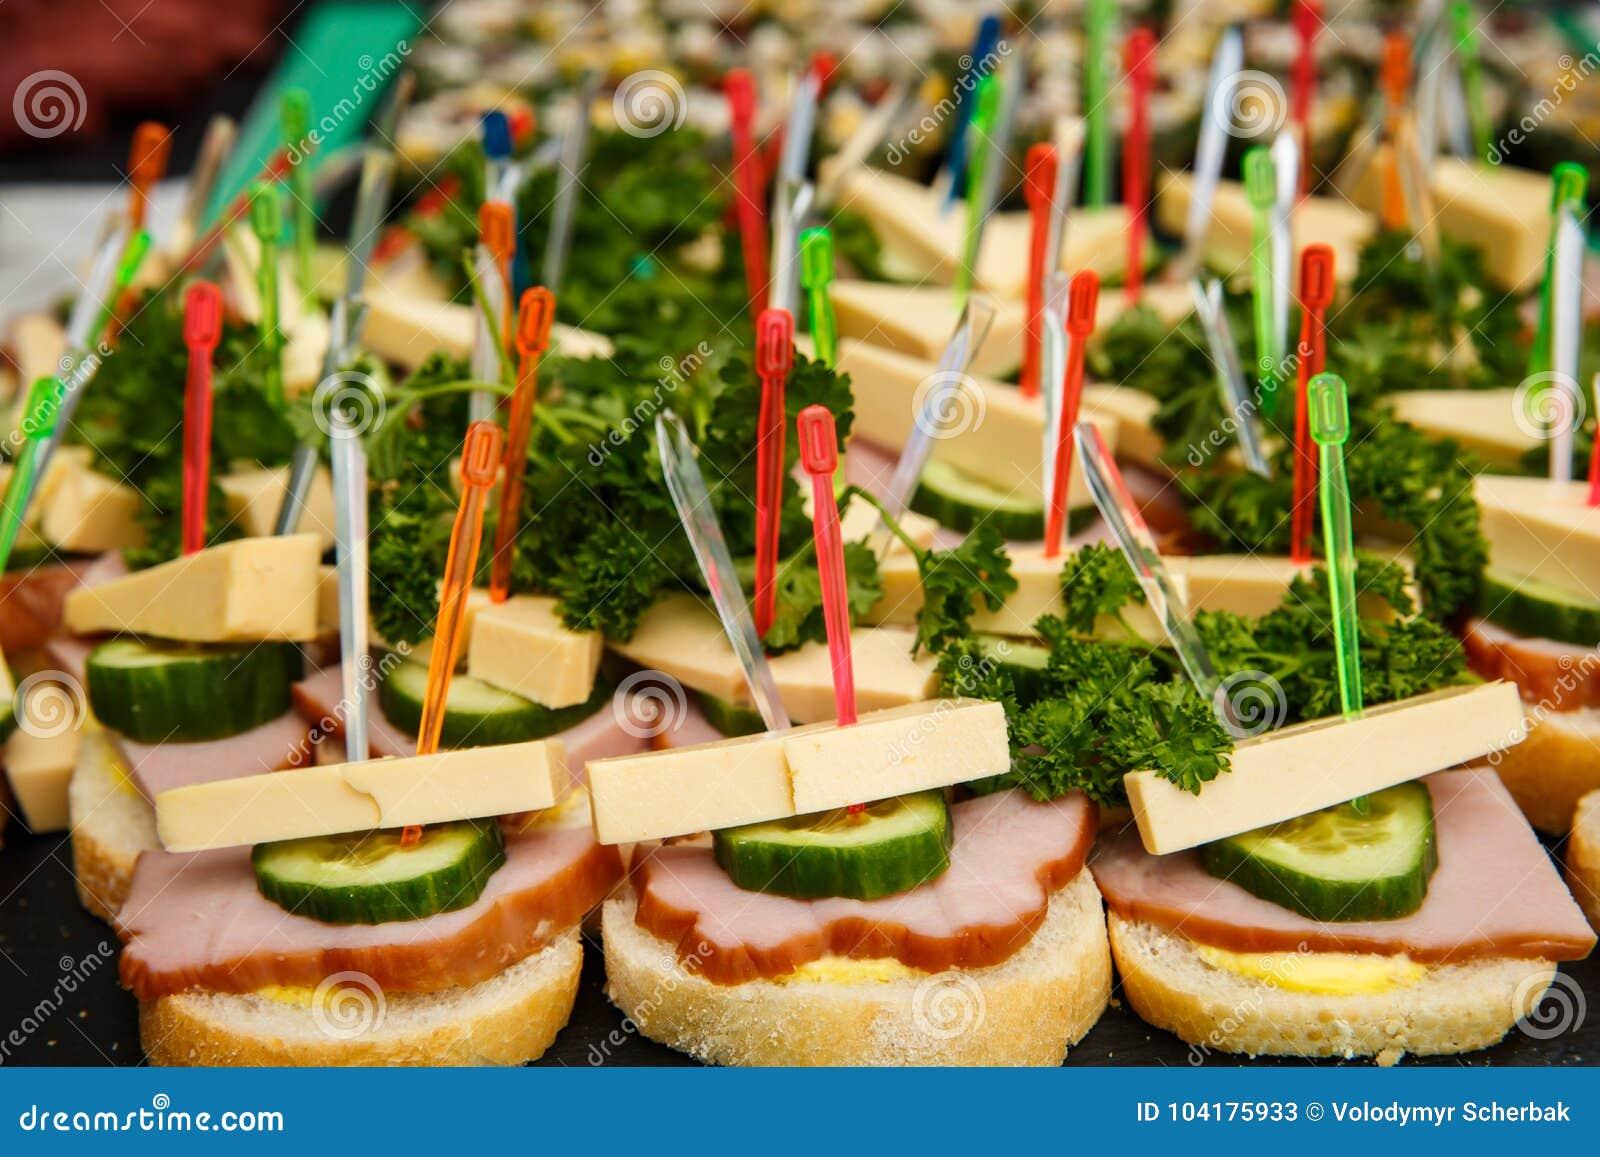 Bruschetti of canapes met kaas, olijven, ham, komkommer